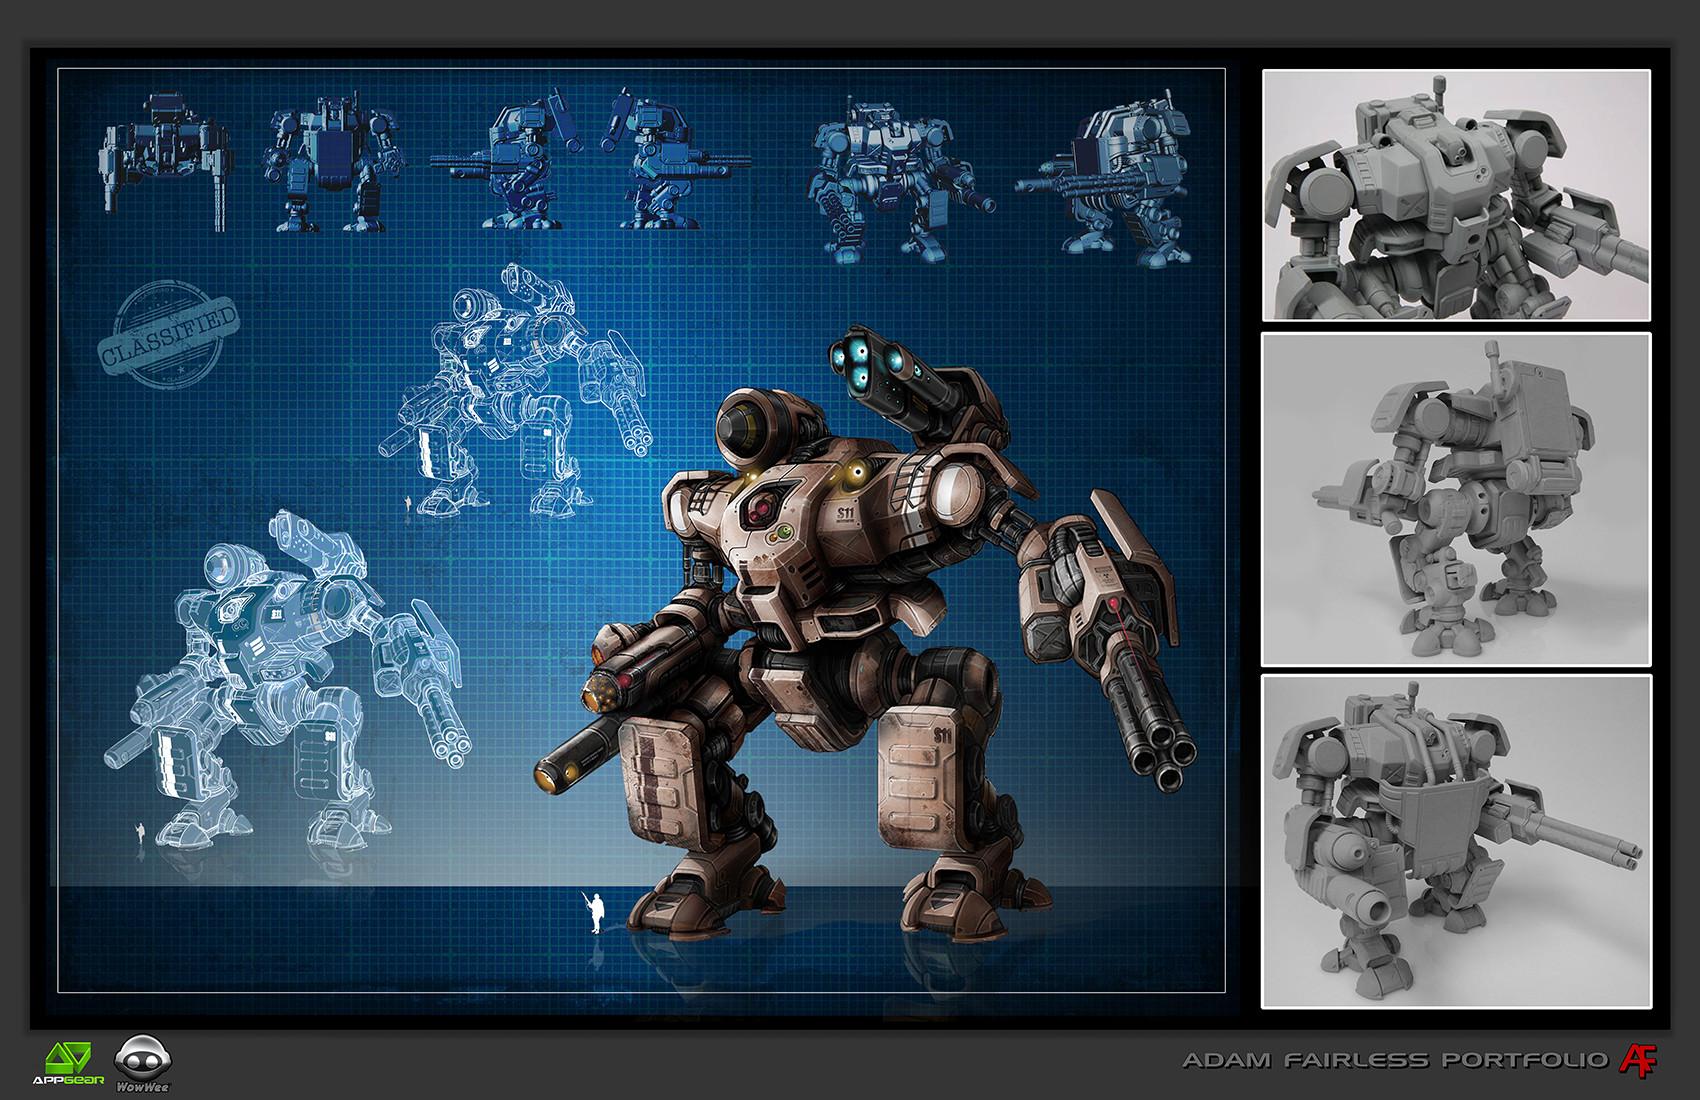 Game Character Design Apps : Artstation robot concept design for app based game adam fairless